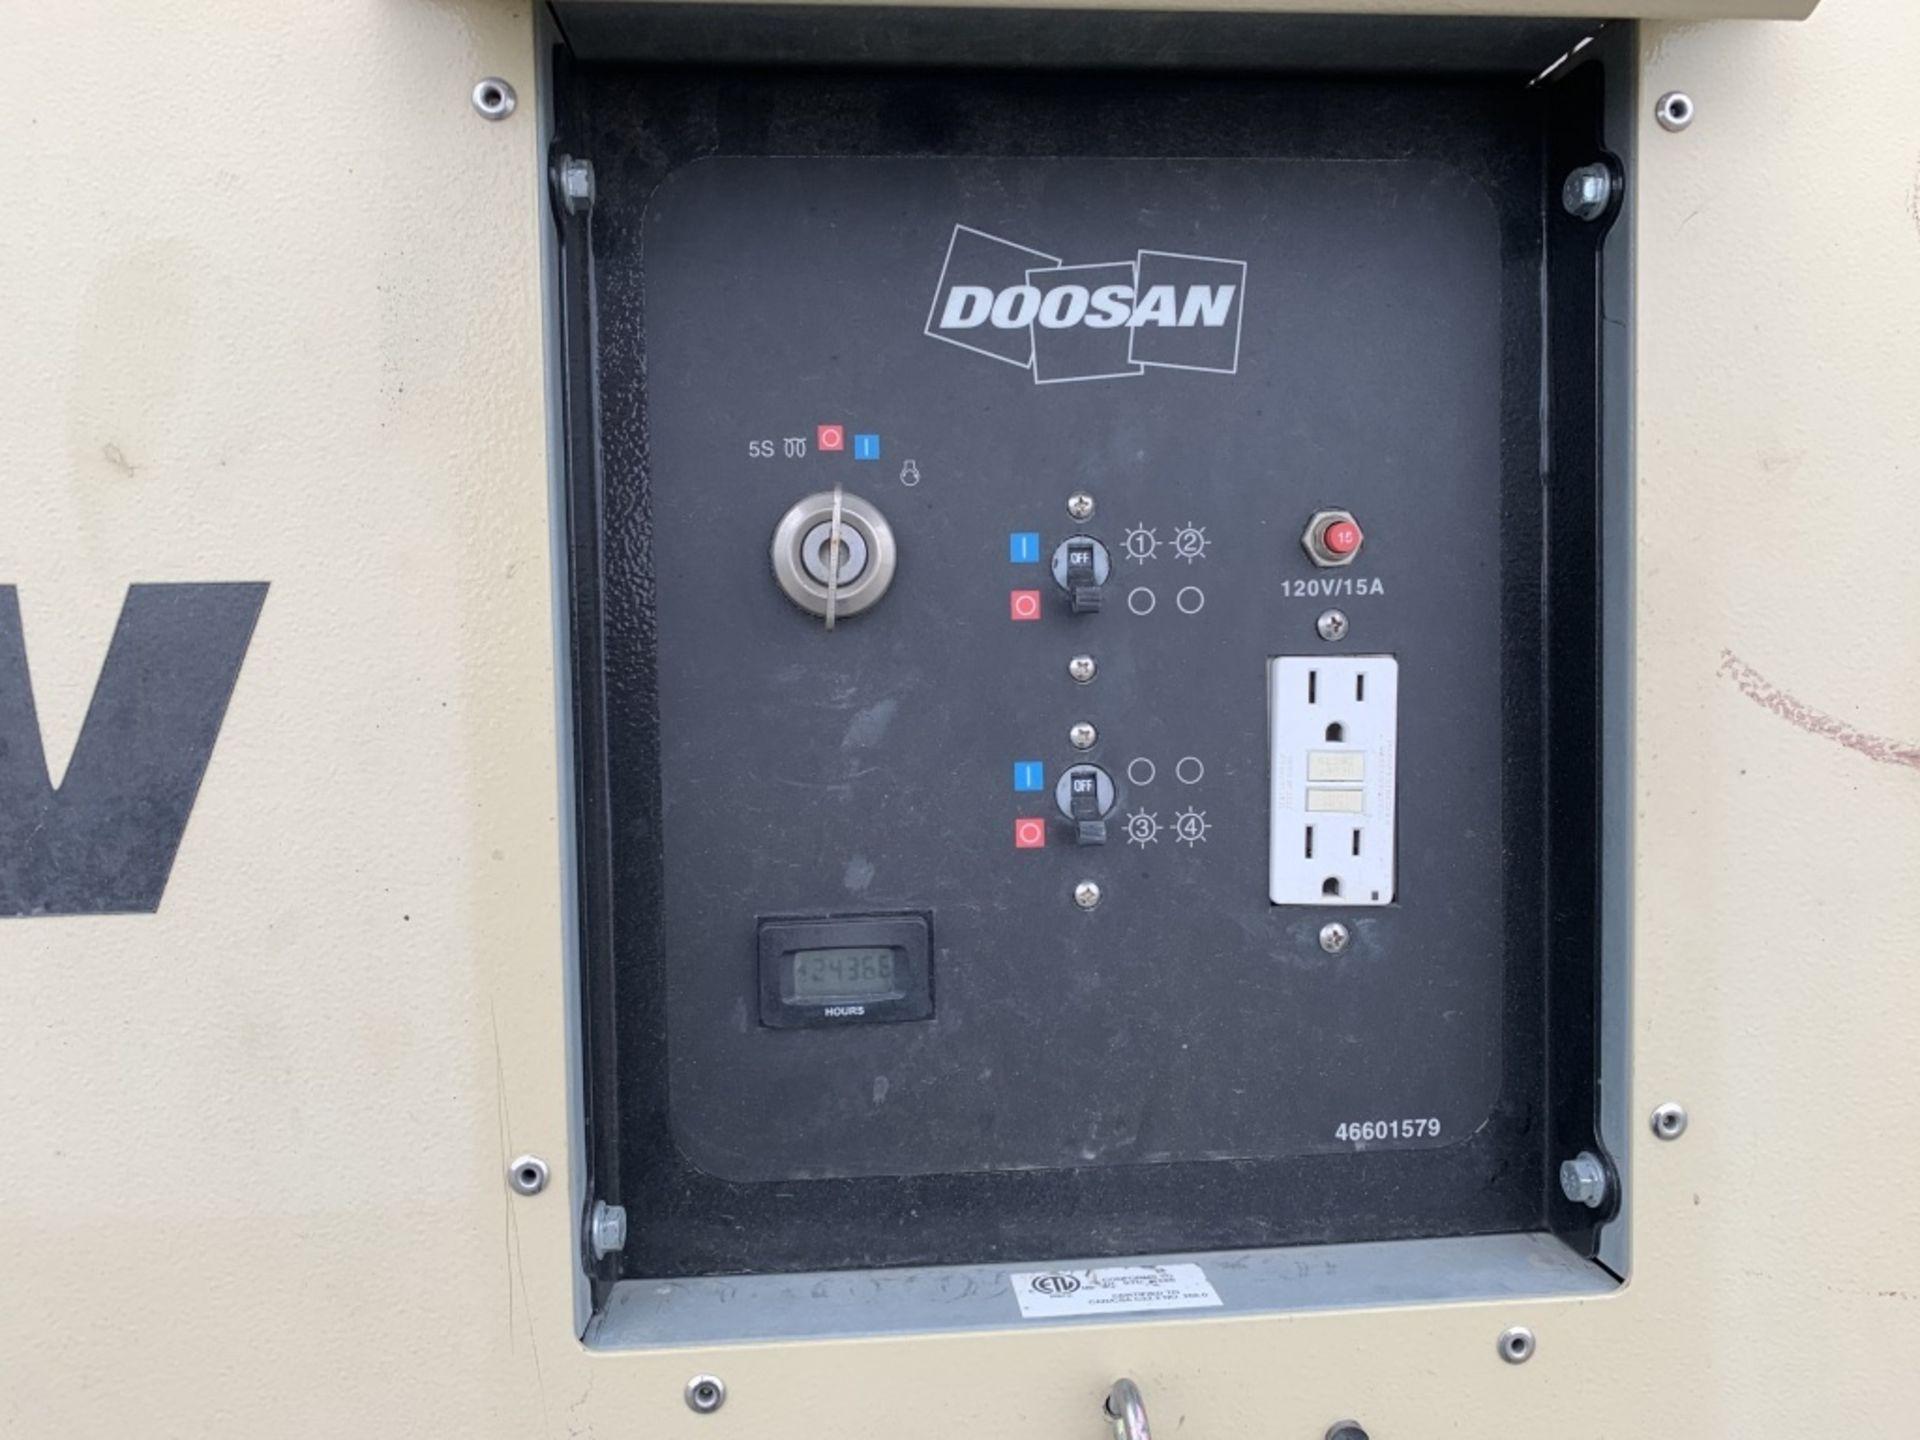 Lot 33 - 2015 Doosan LSC Towable Light Tower